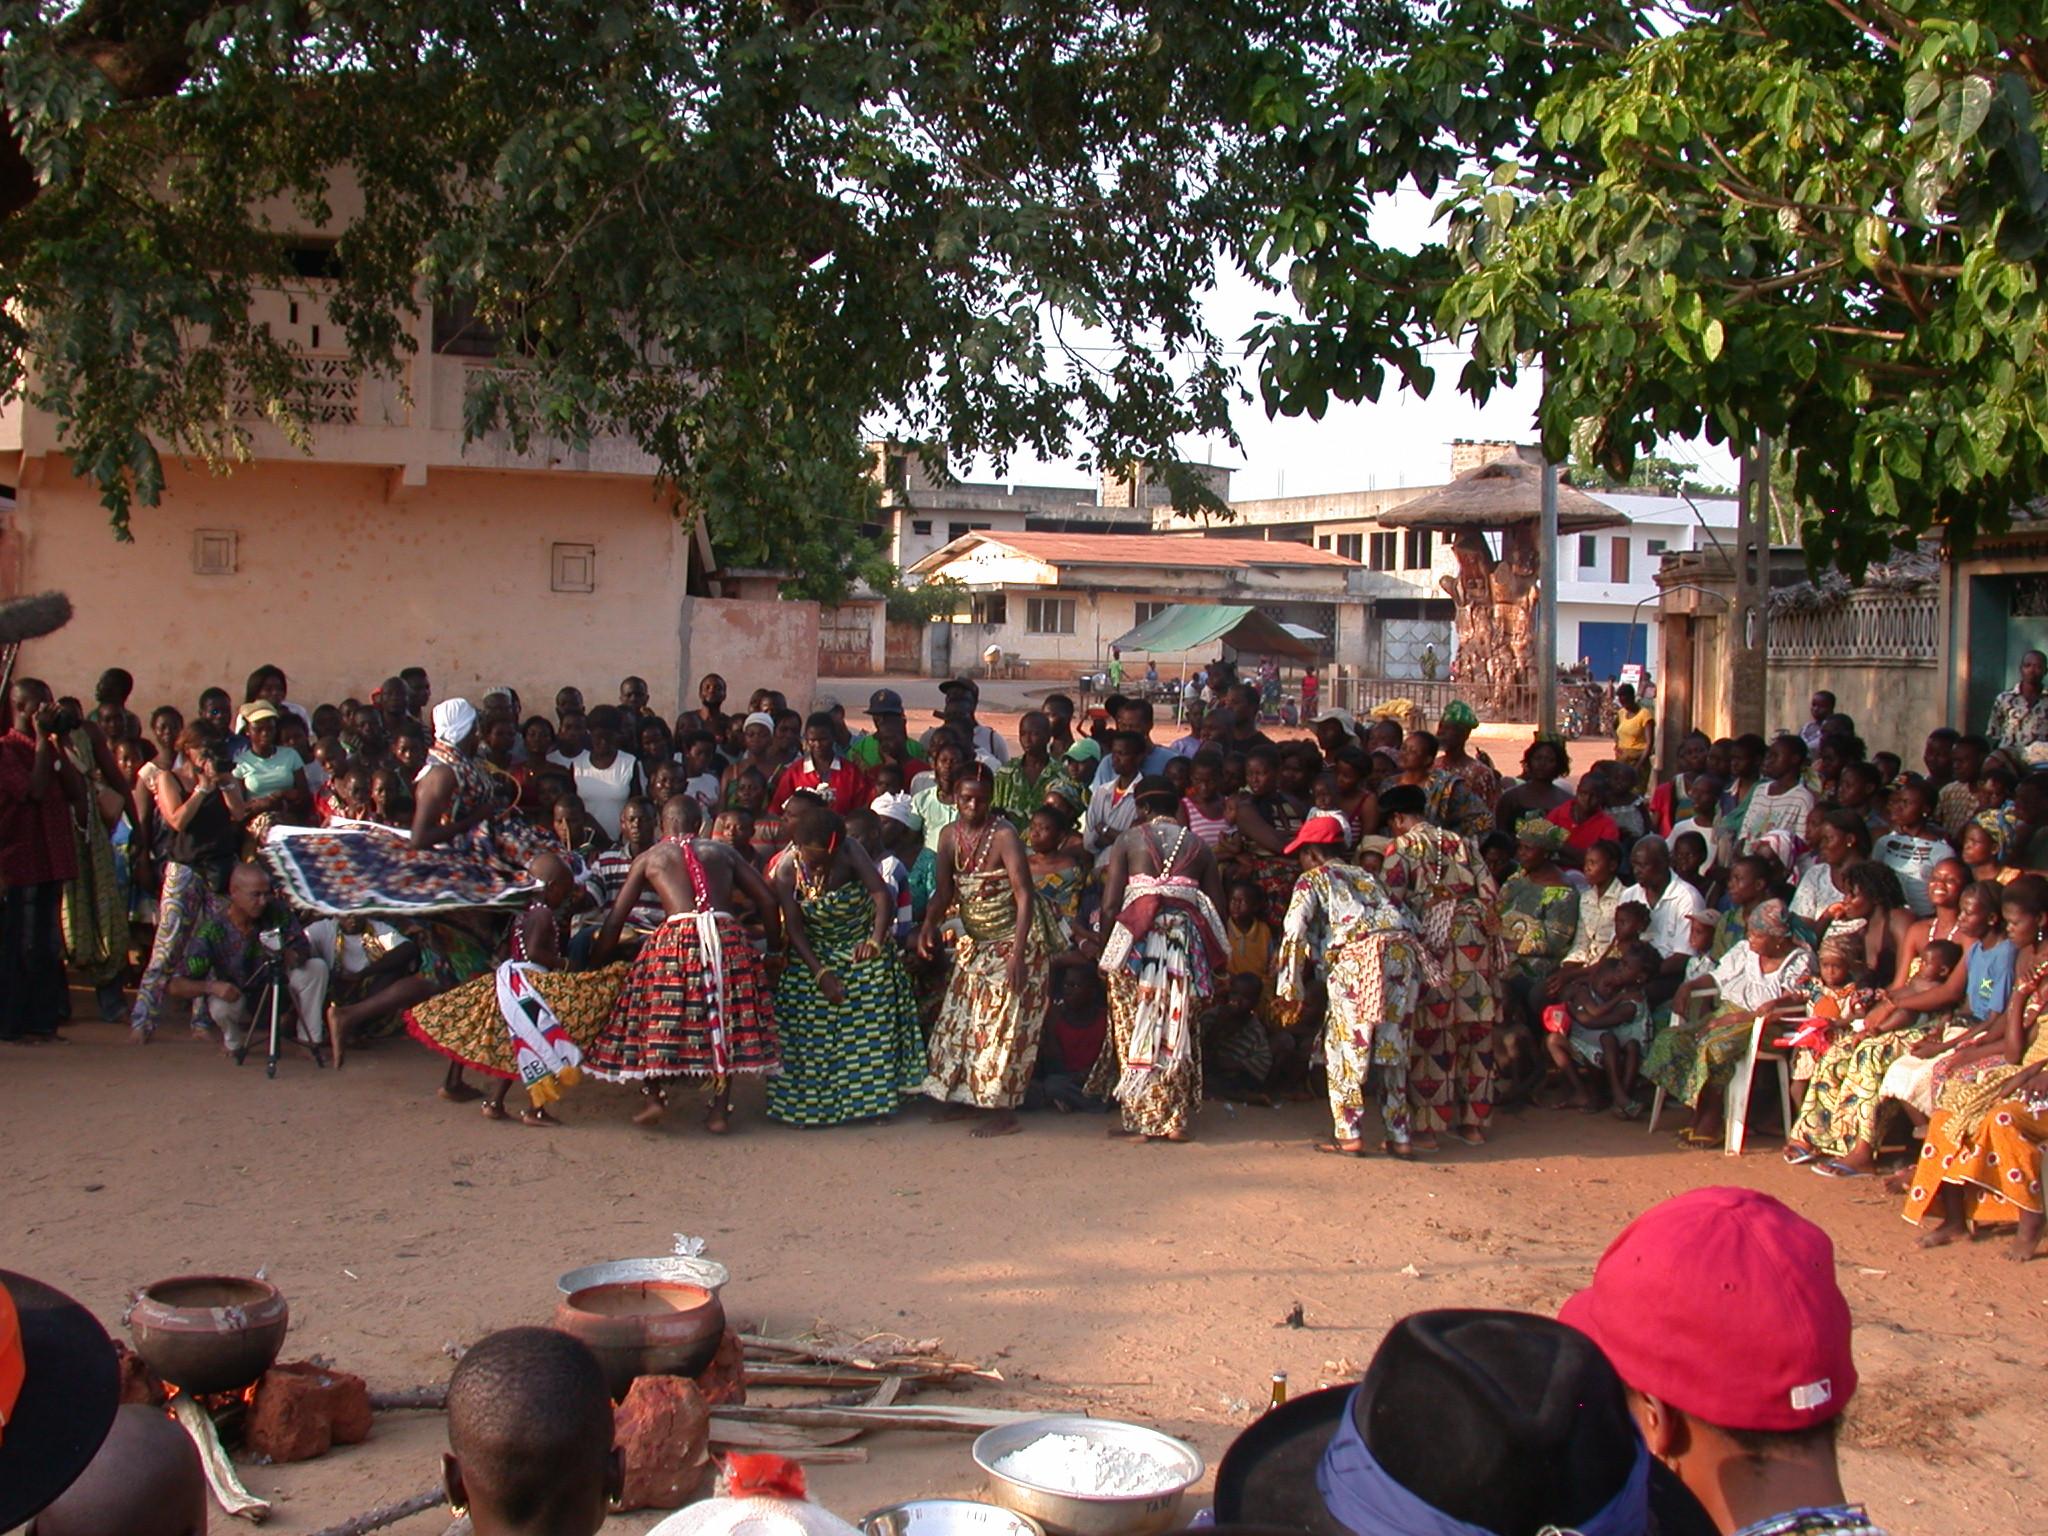 Initiates Dancing, Vodun Ritual, Ouidah, Benin